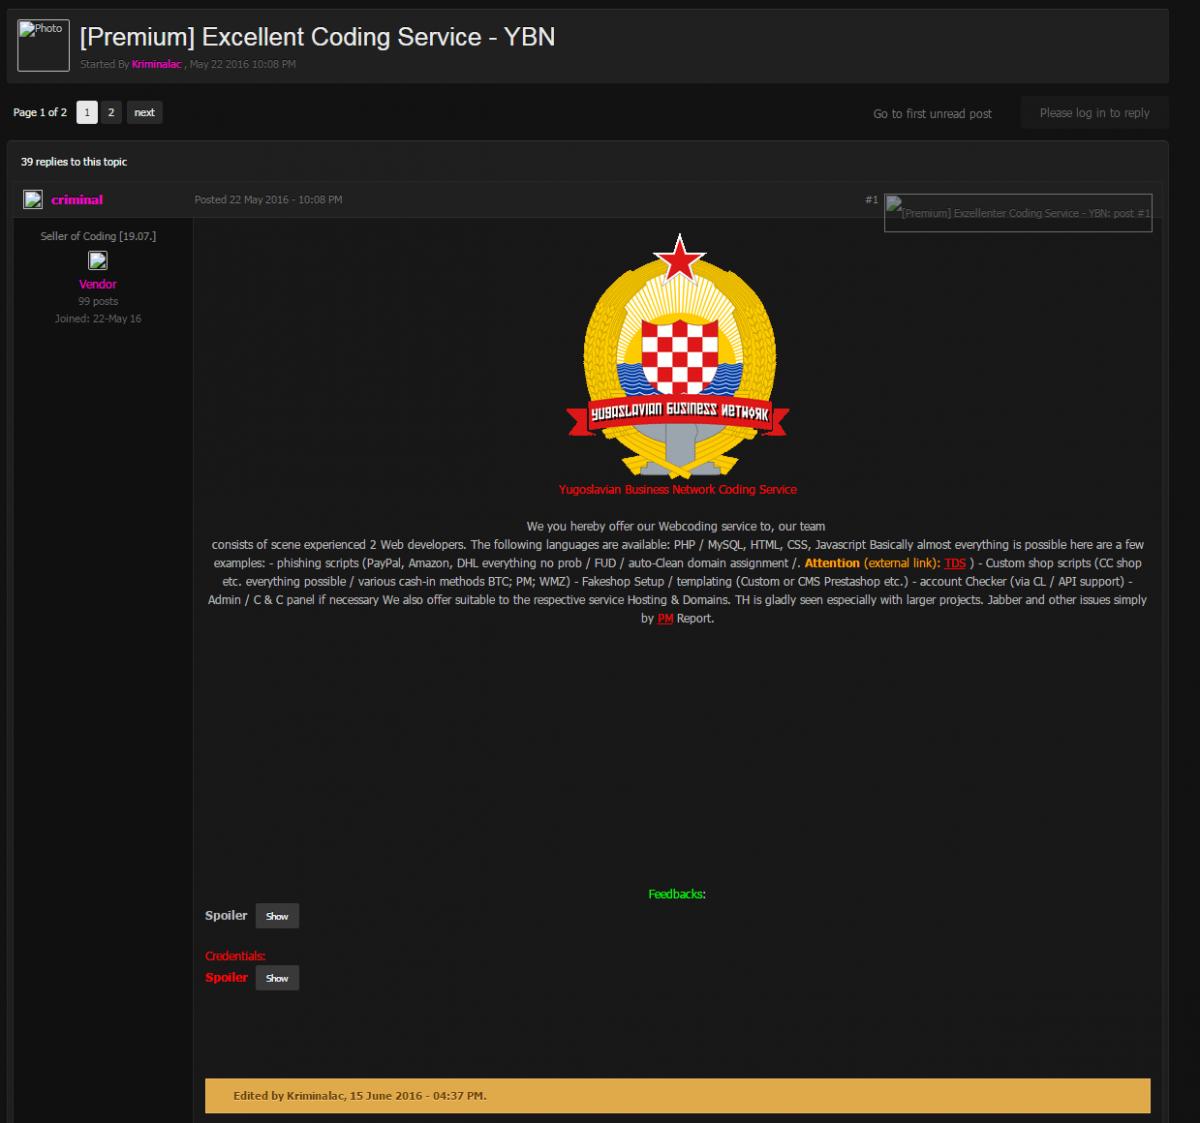 Sundown EK ad on a German-speaking underground hacking forum